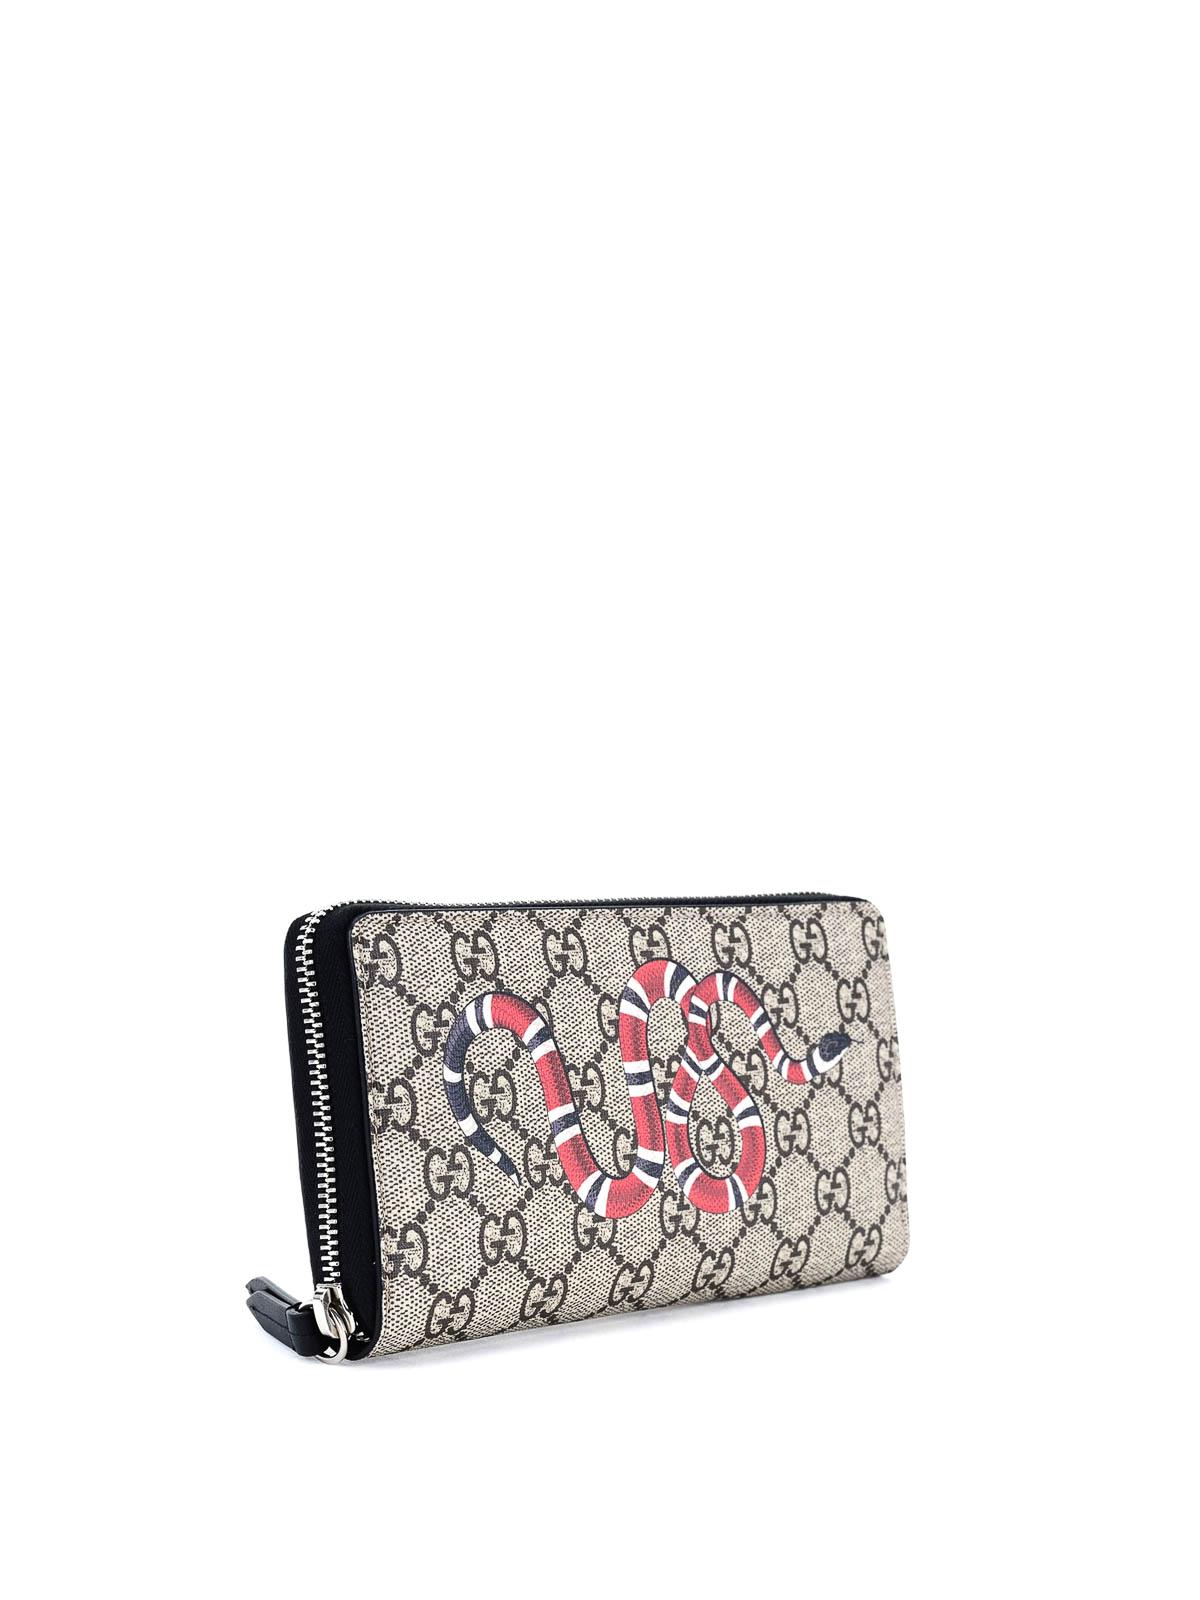 12ac1b1f1078 GUCCI: wallets & purses online - Snake print GG Supreme wallet